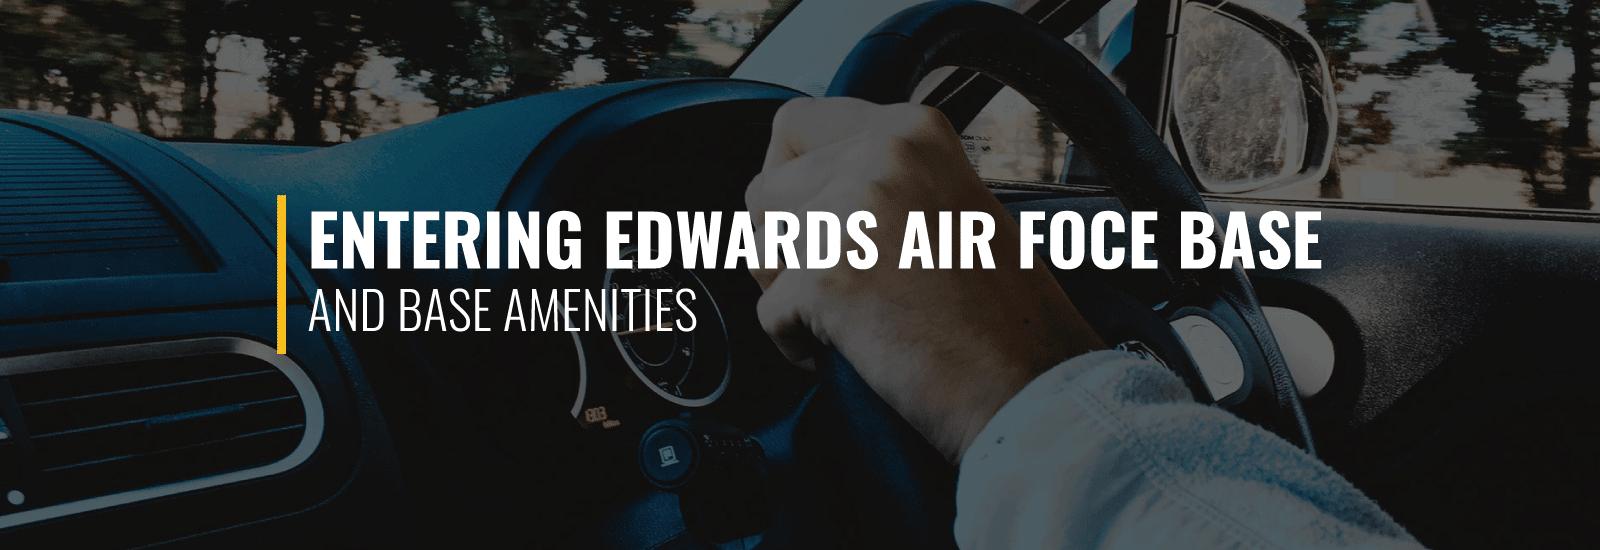 Entering Edwards Air Force Base